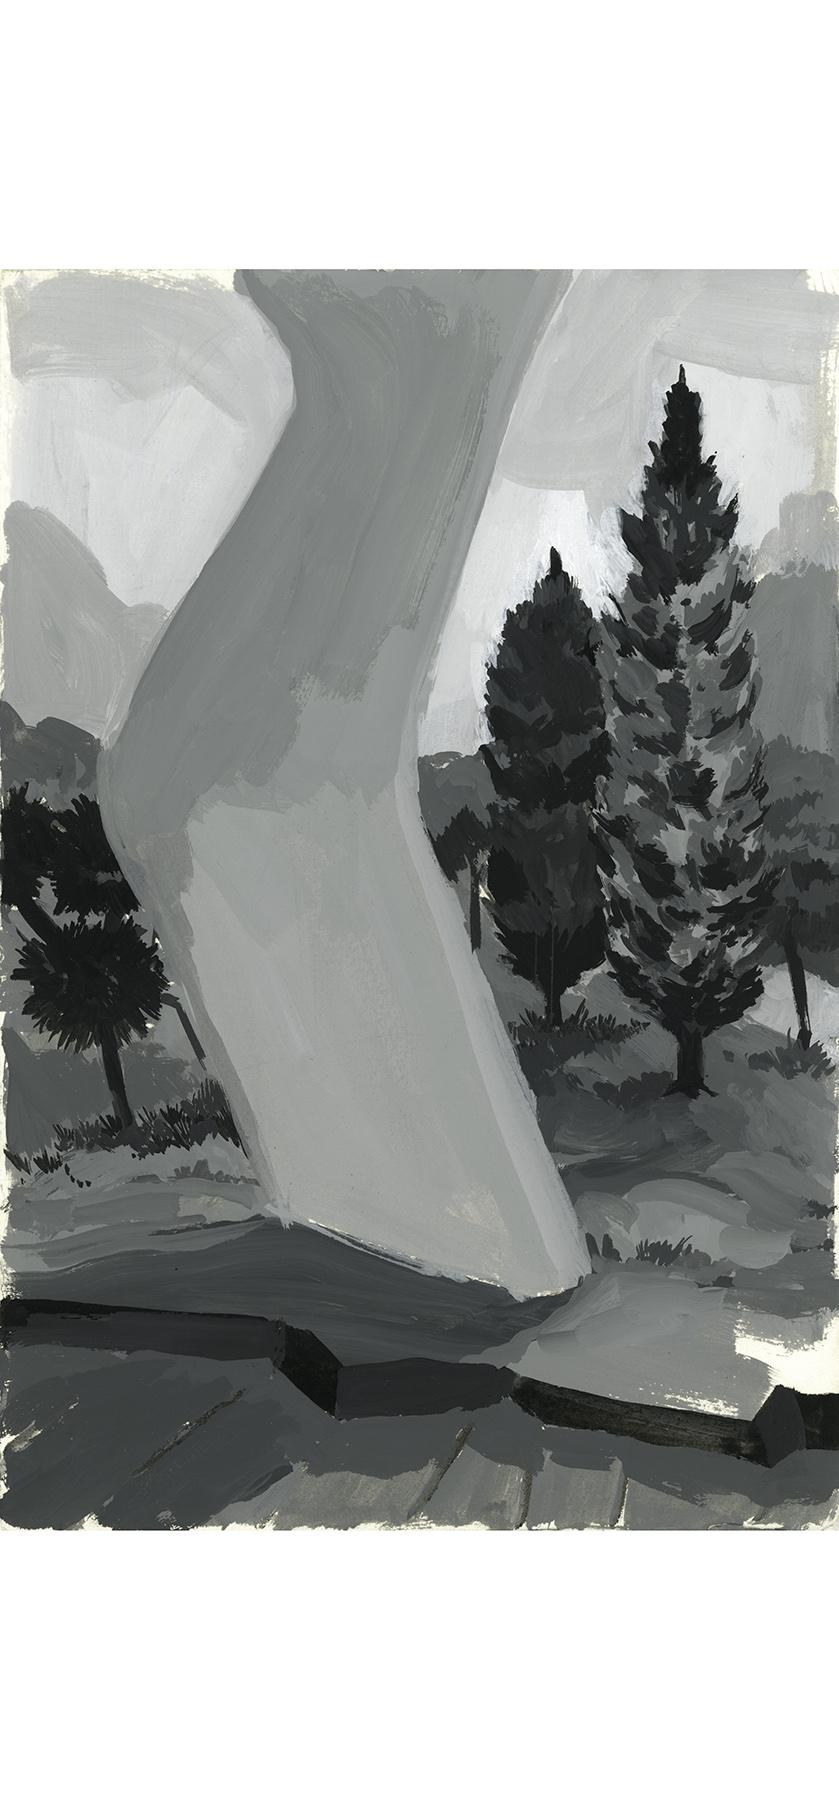 Untitled Study